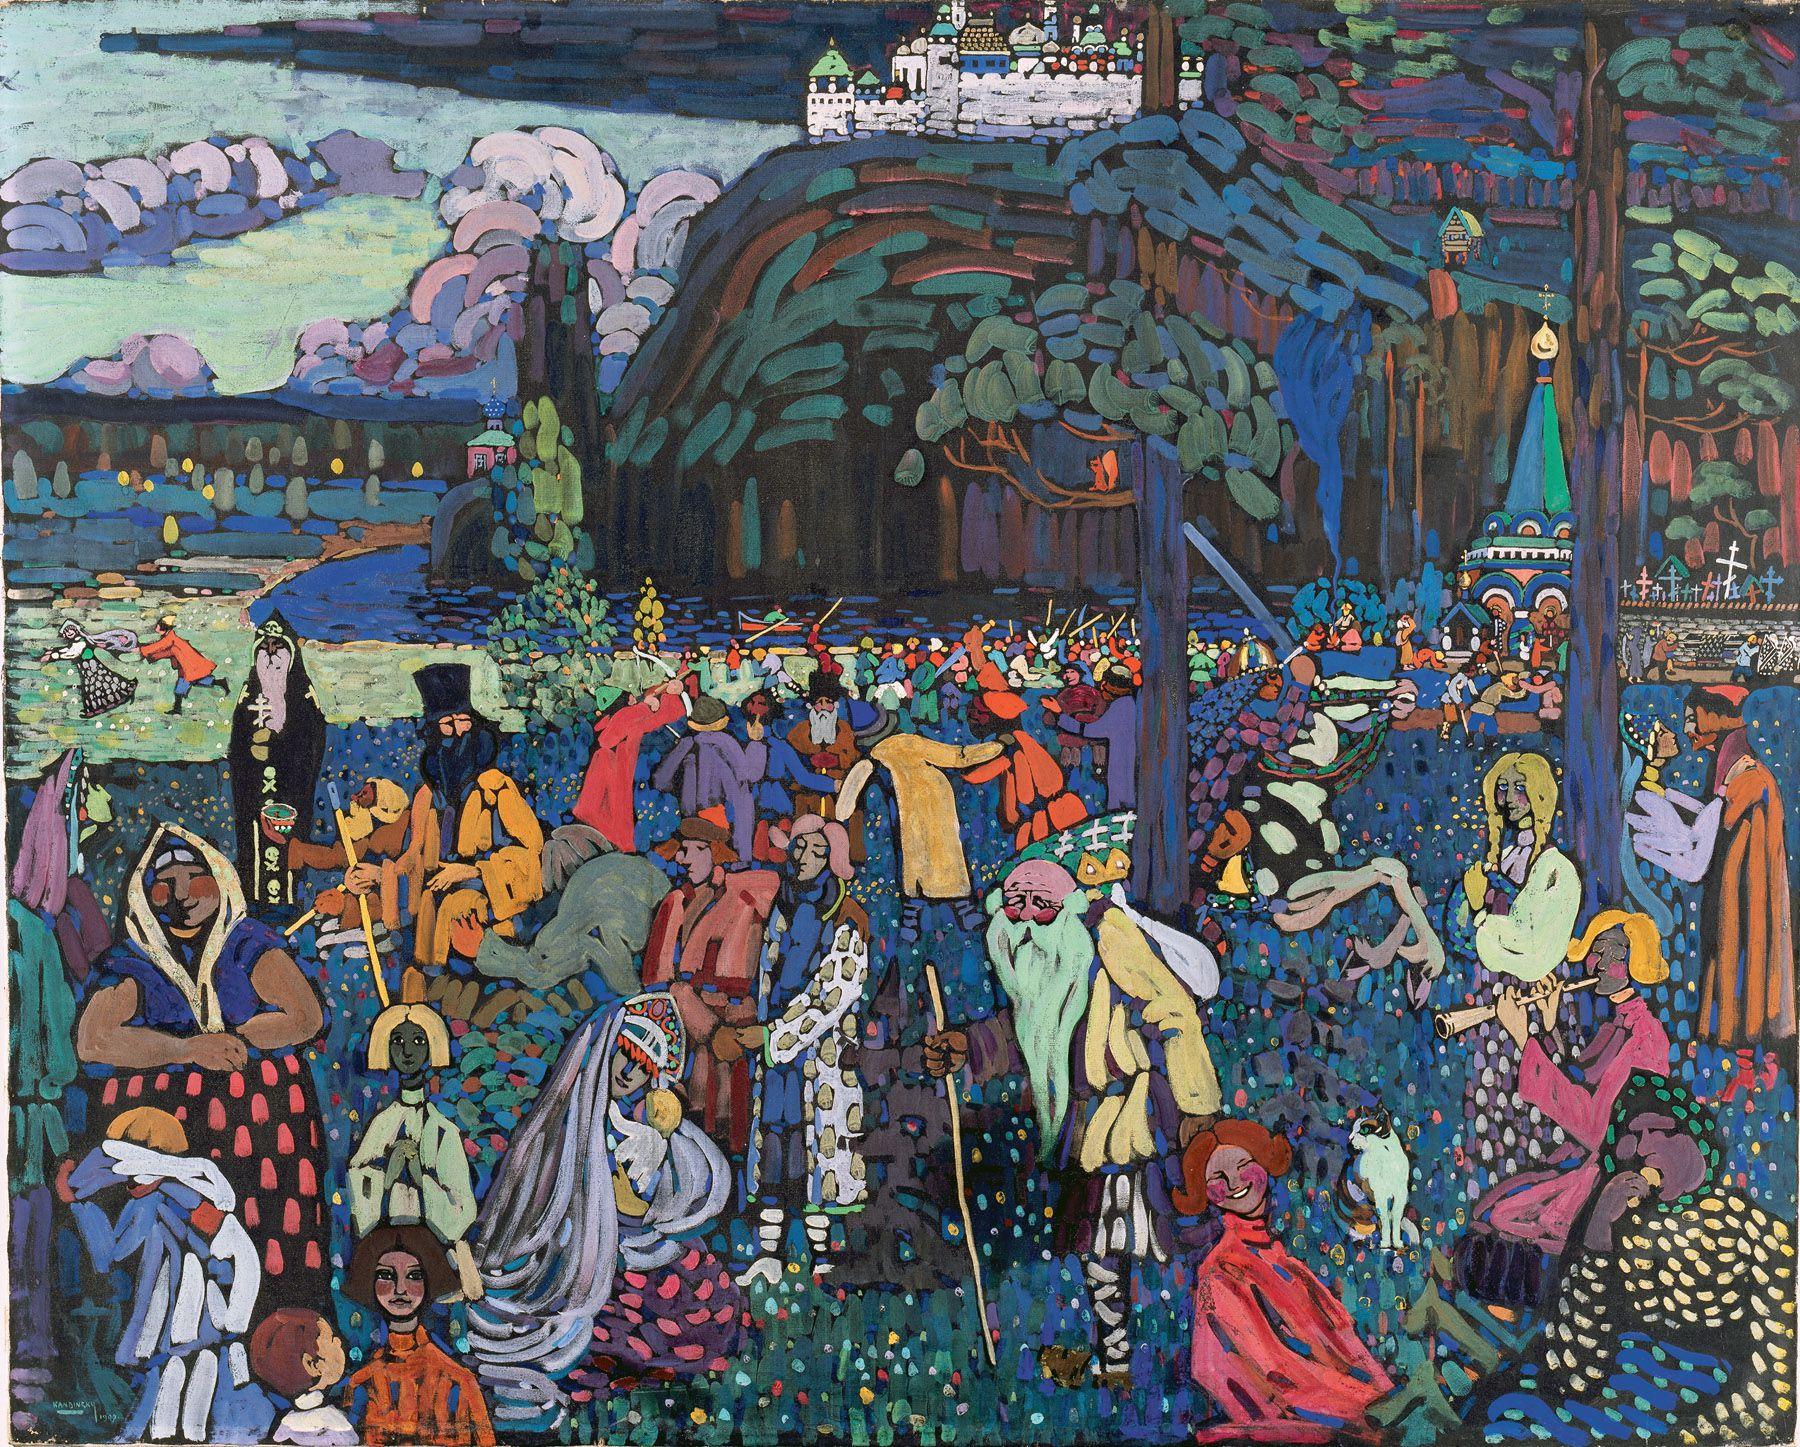 Wassily Kandinsky (Russian, 1866-1944) Wassily Kandinsky (Russian, 1866-1944). A Motley Life (Das Bunte Leben), 1907. Tempera on canvas. 51 1/8 x 63 15/16 in. (130 x 162.5 cm). Bayerische Landesbank, on permanent loan to the Städtische Galerie im Lenbachhaus, Munich.